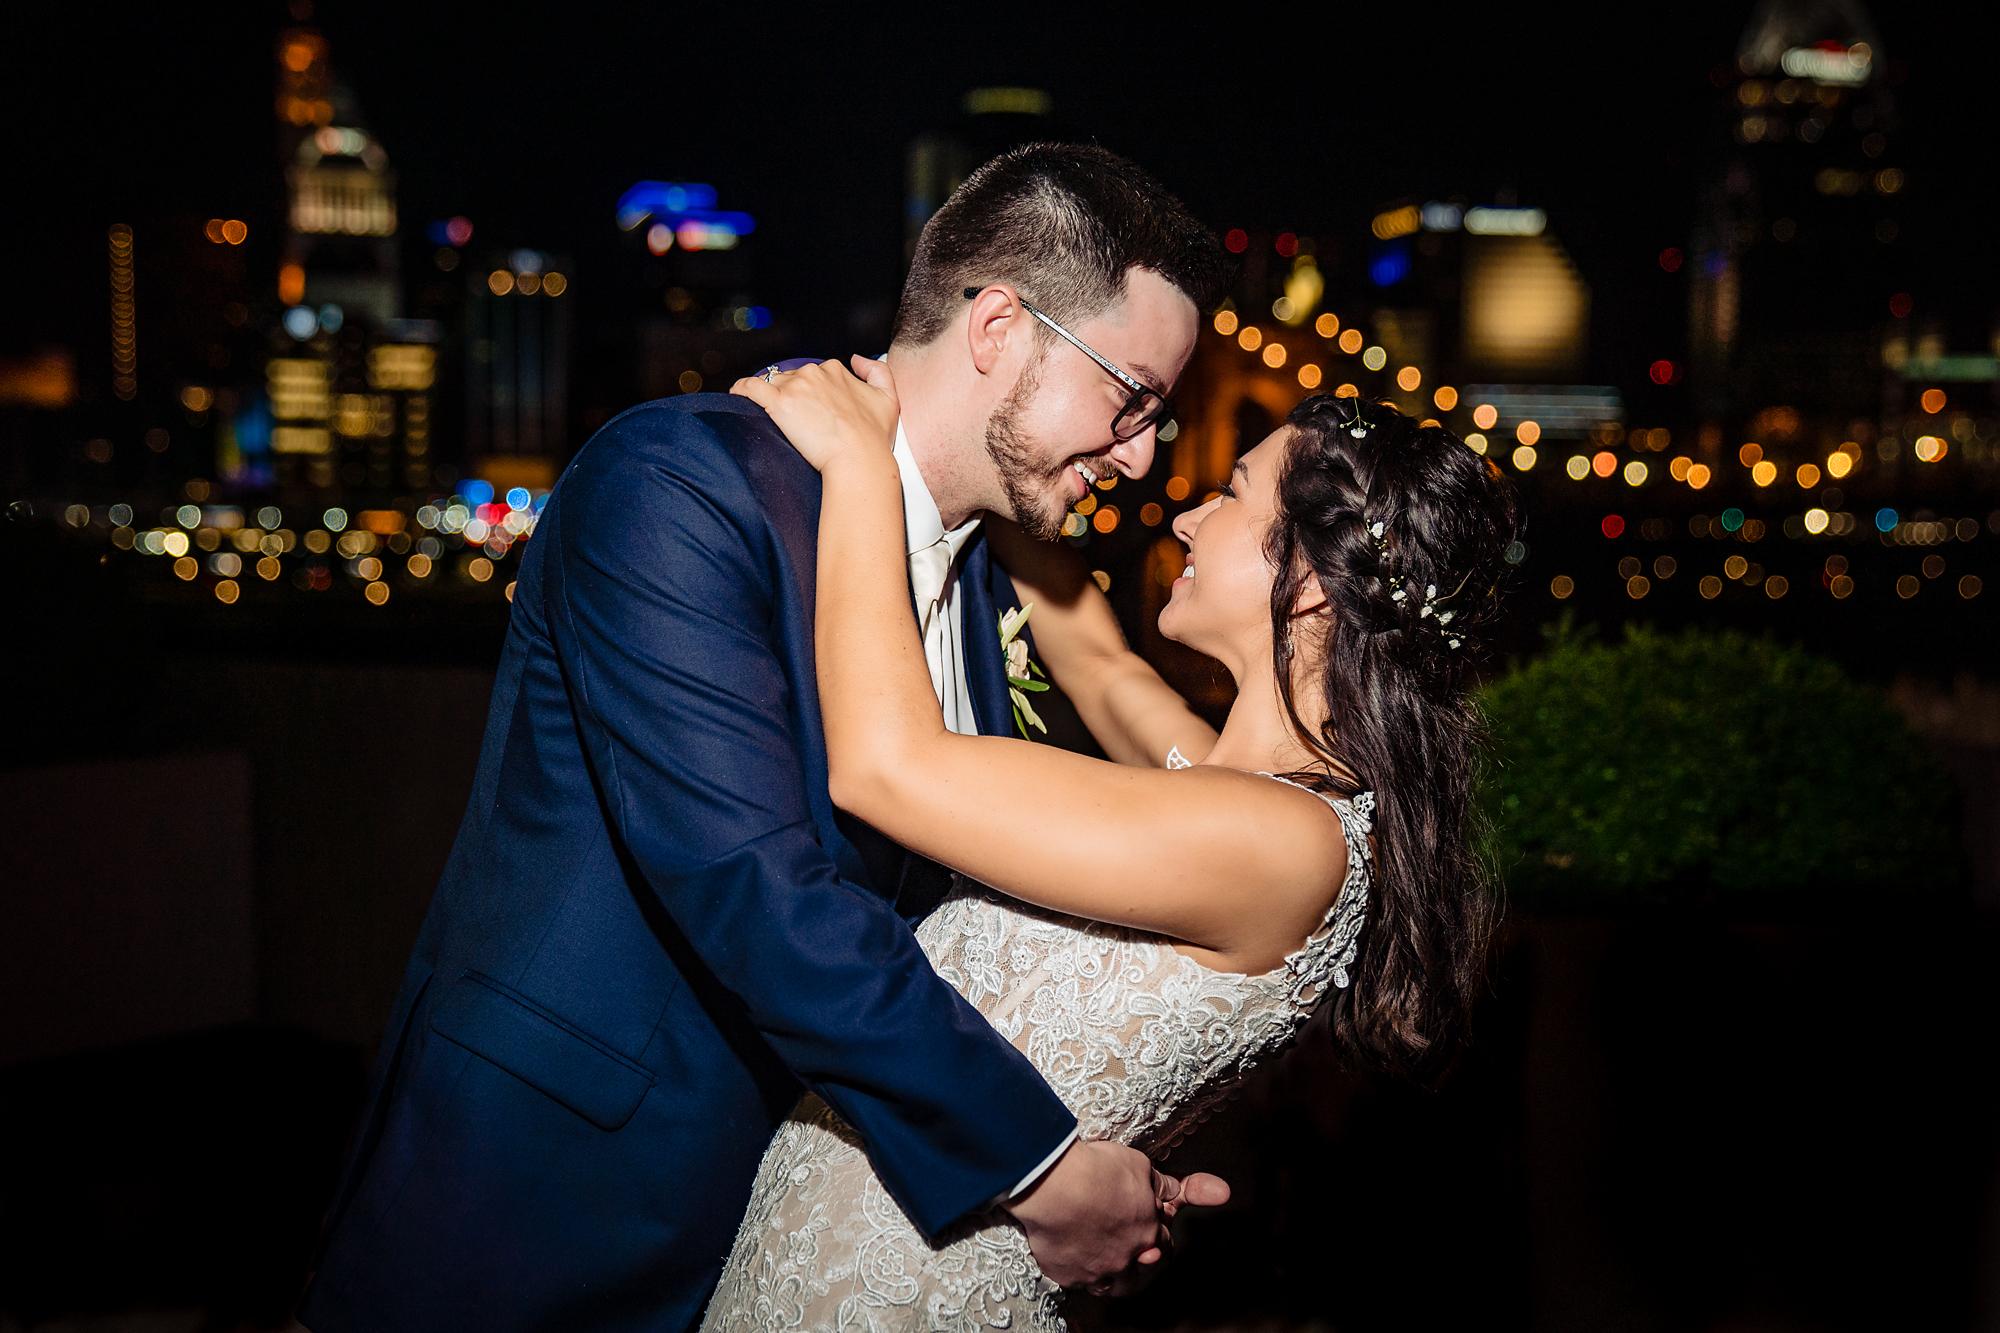 Embassy-Suites-Rivercenter-Wedding-Photography-38.jpg